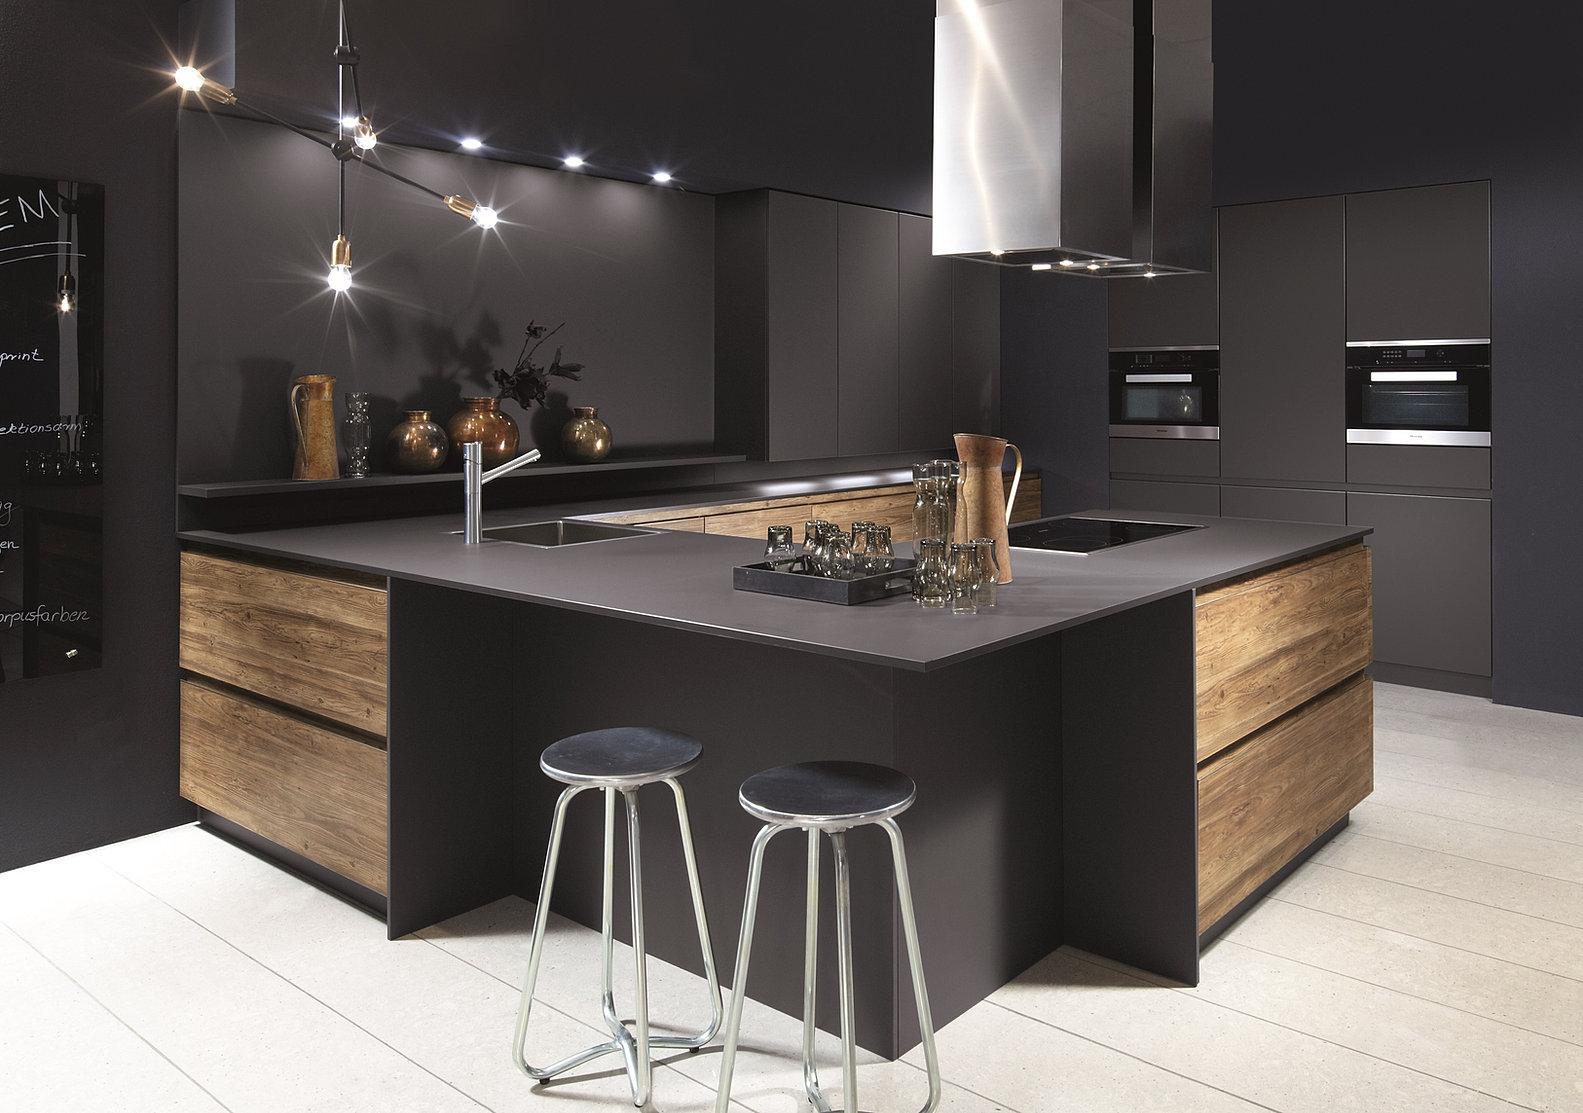 Idee Salle De Bain Original : , cuisine schmidt , design concept hannut, delforterie, cuisine